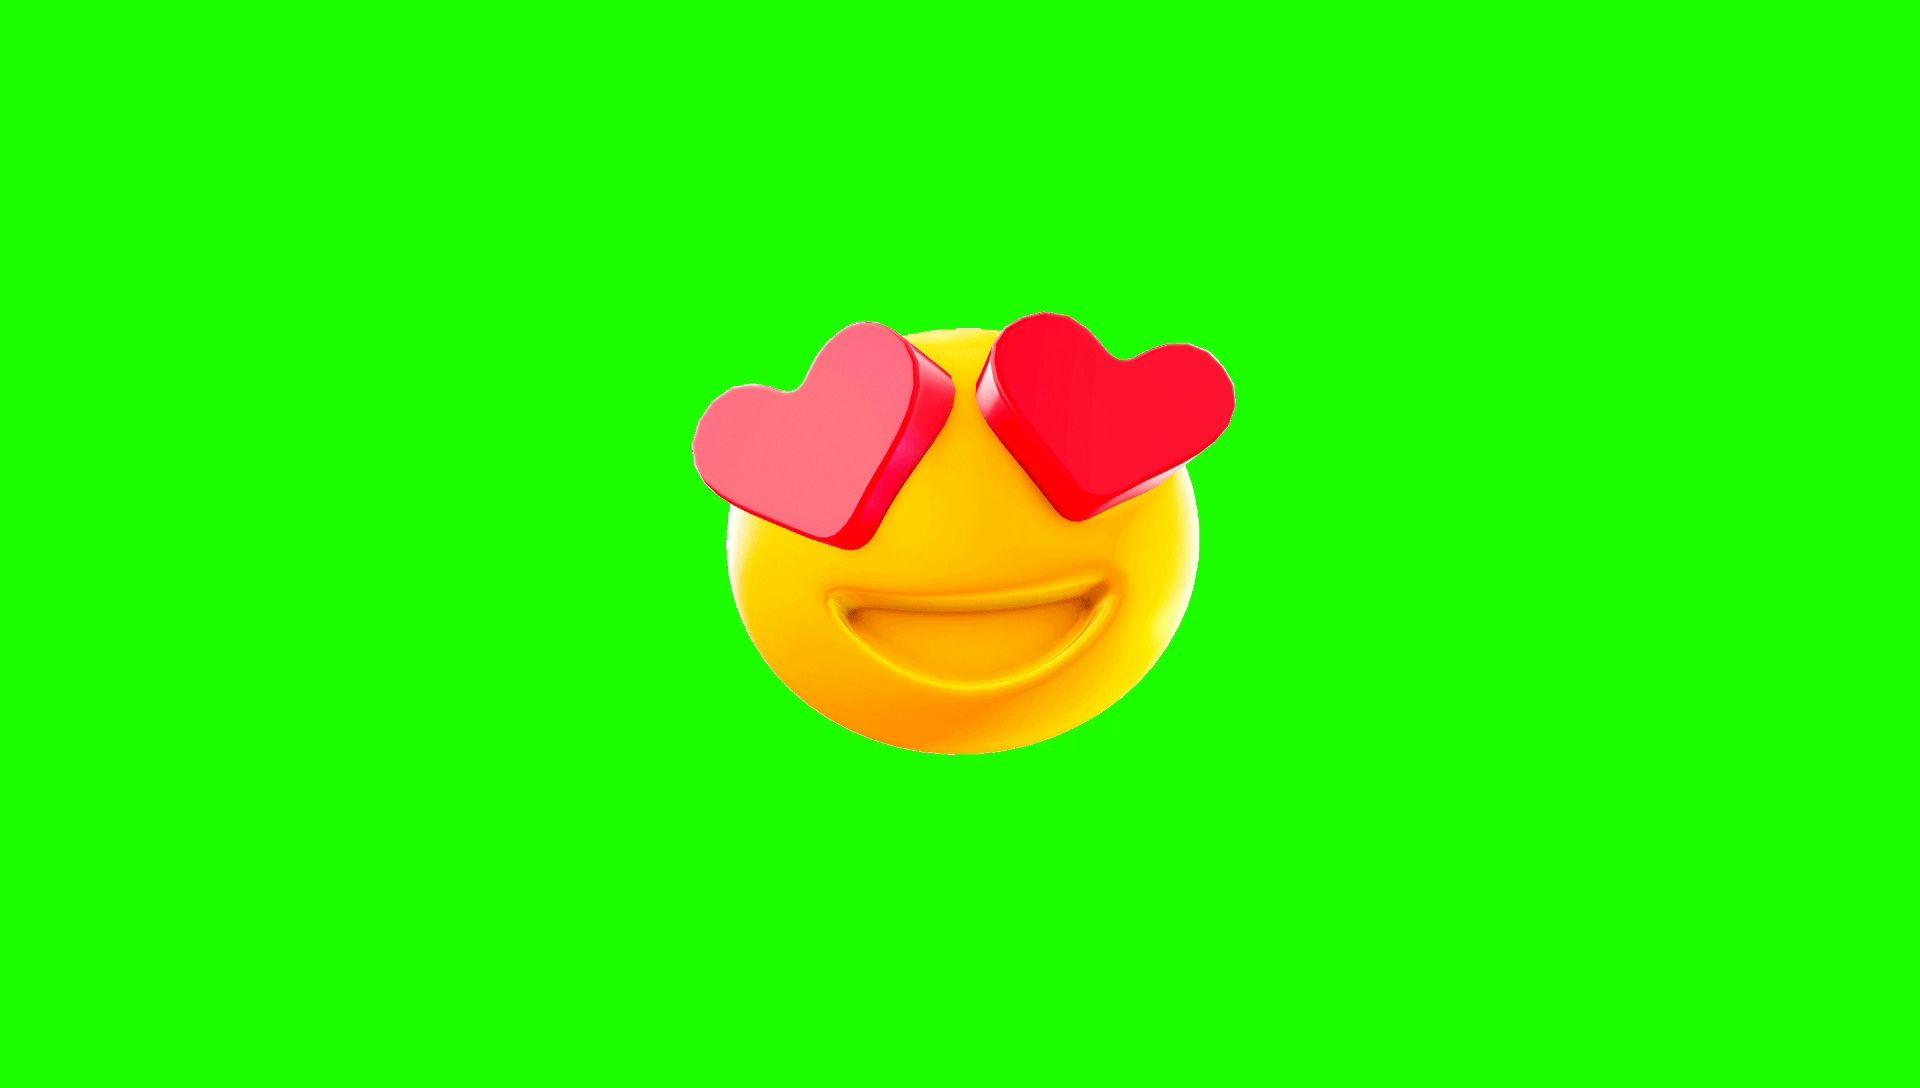 3D Green Screen Screen Bouncing Emoji Video Kinemaster Effect Download